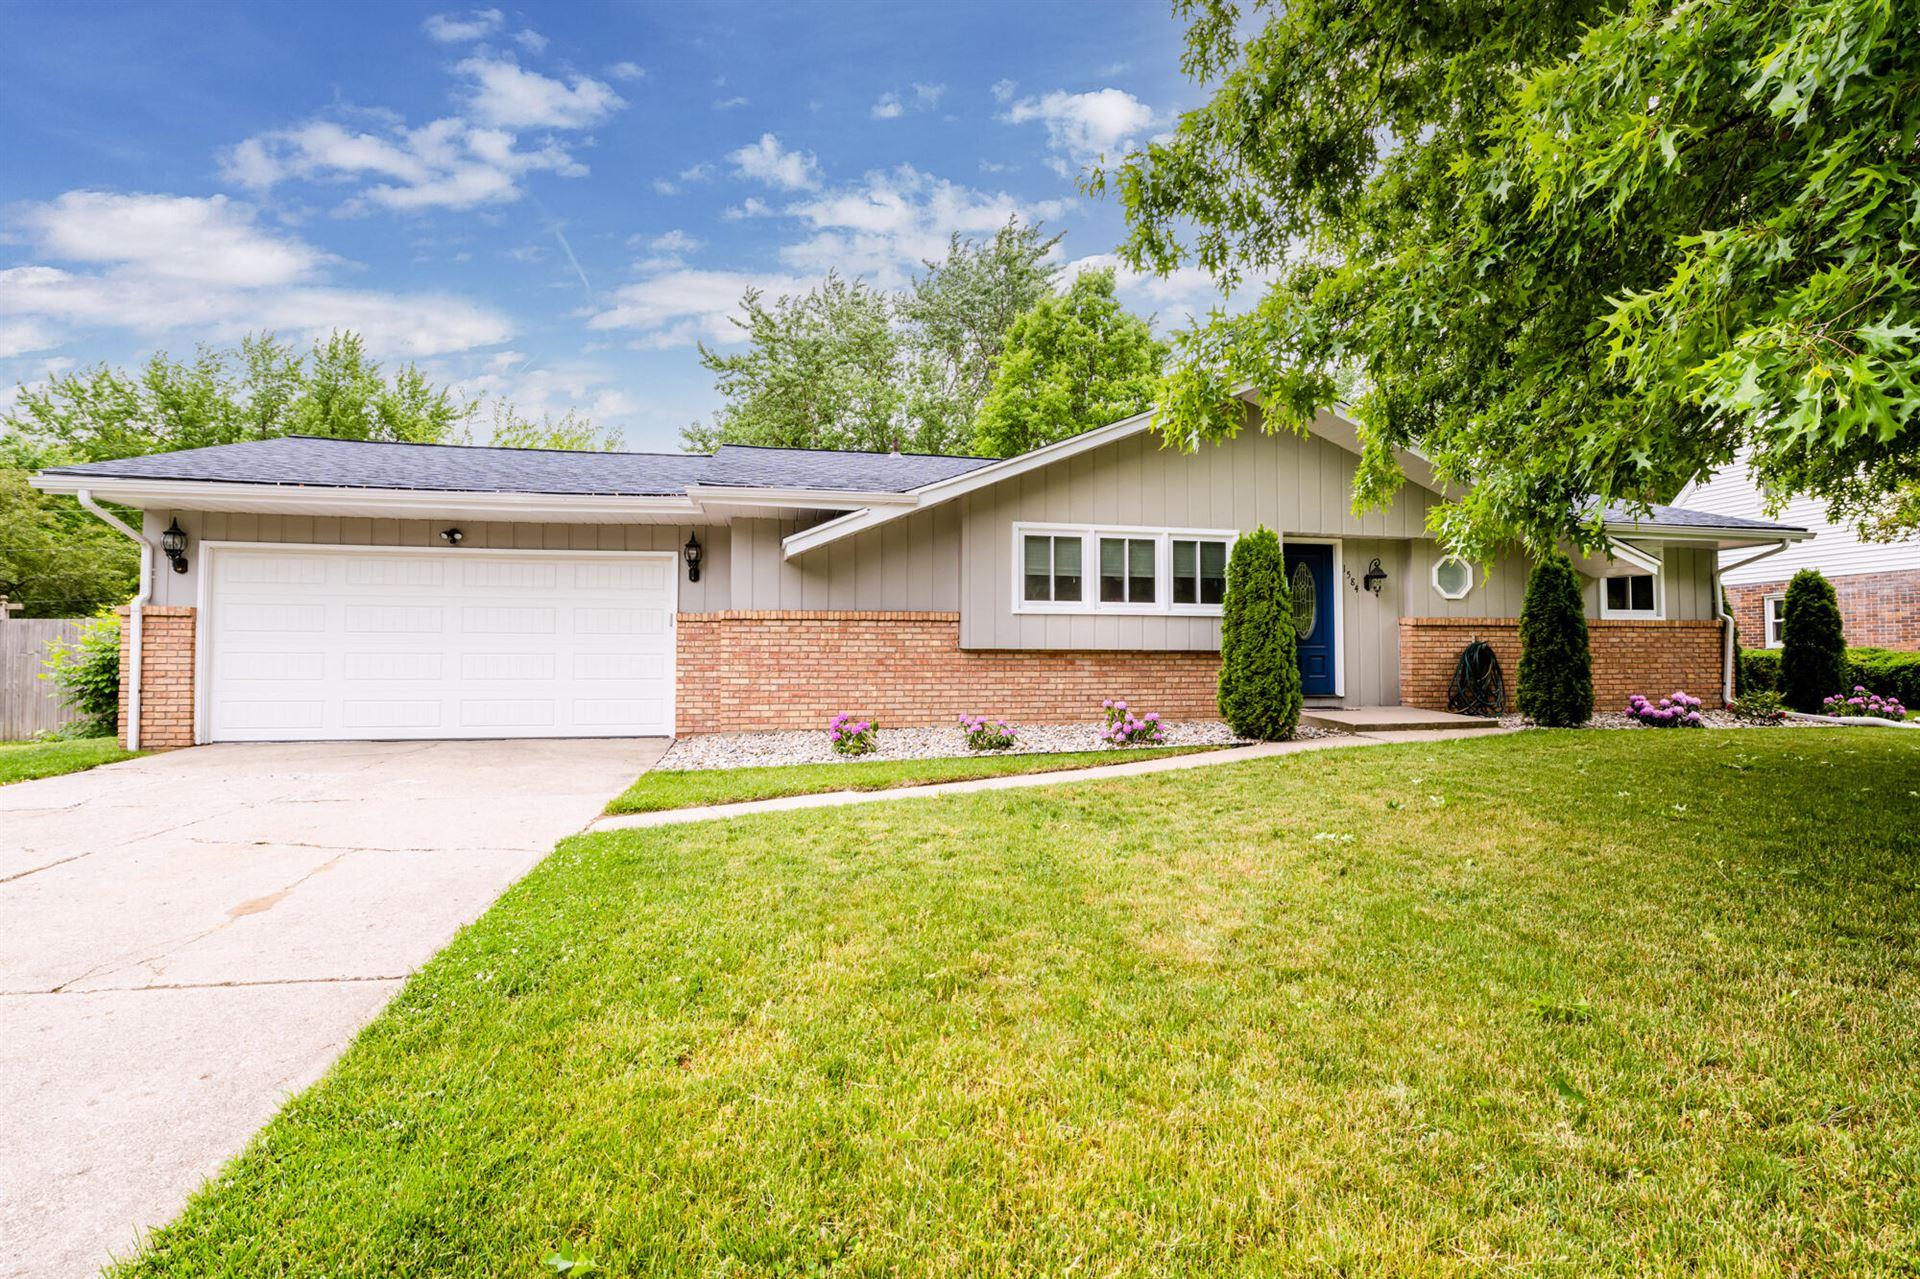 1584 S Teakwood Drive, Stevensville, MI 49127 - MLS#: 21020016